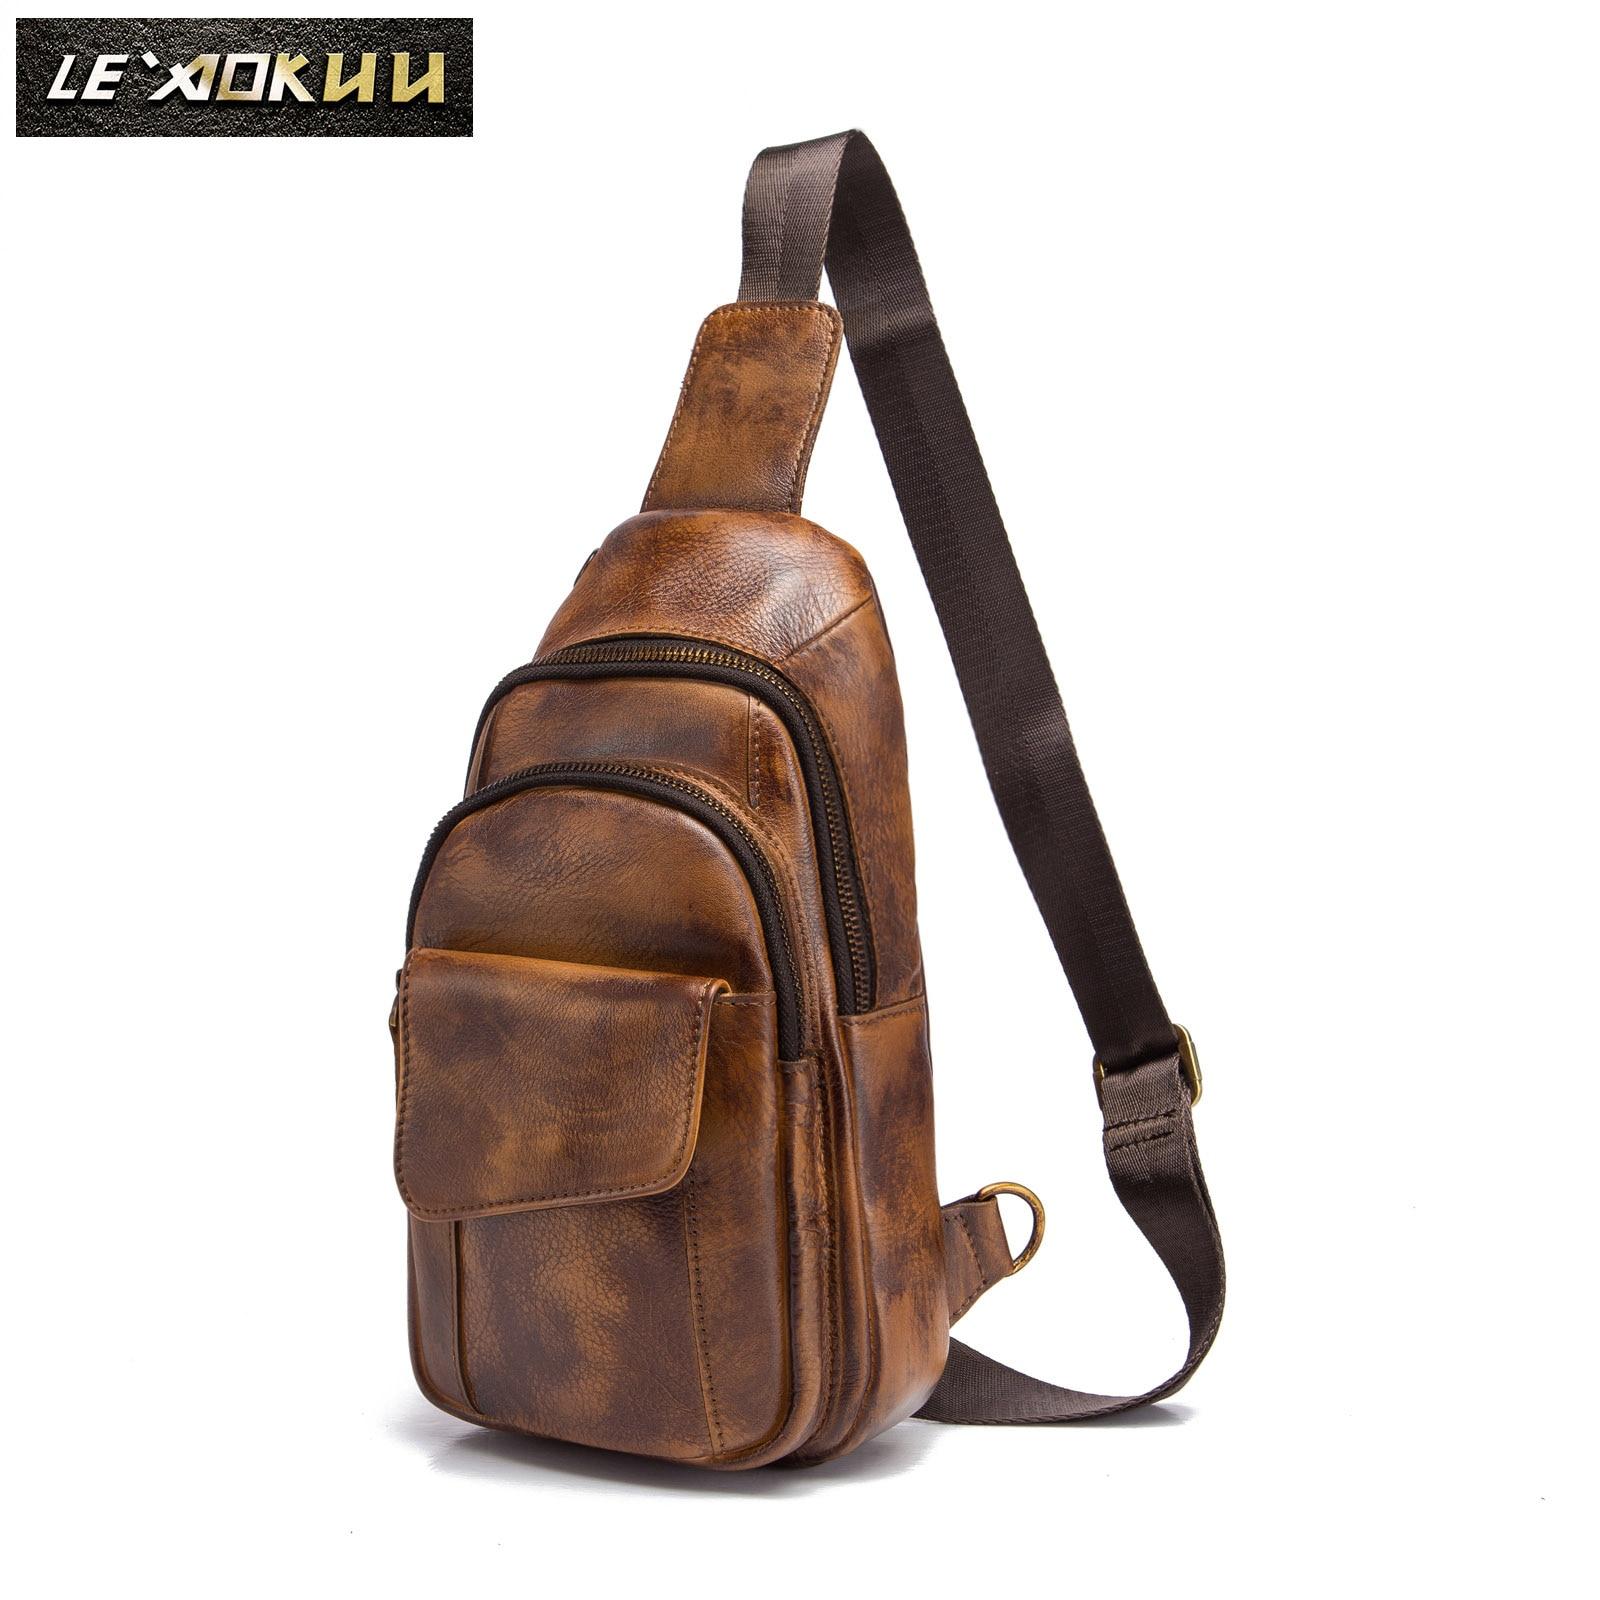 Men Original Crazy Horse Leather Casual Fashion Crossbody Chest Sling Bag Design Travel One Shoulder Bag Daypack Male 8013lb